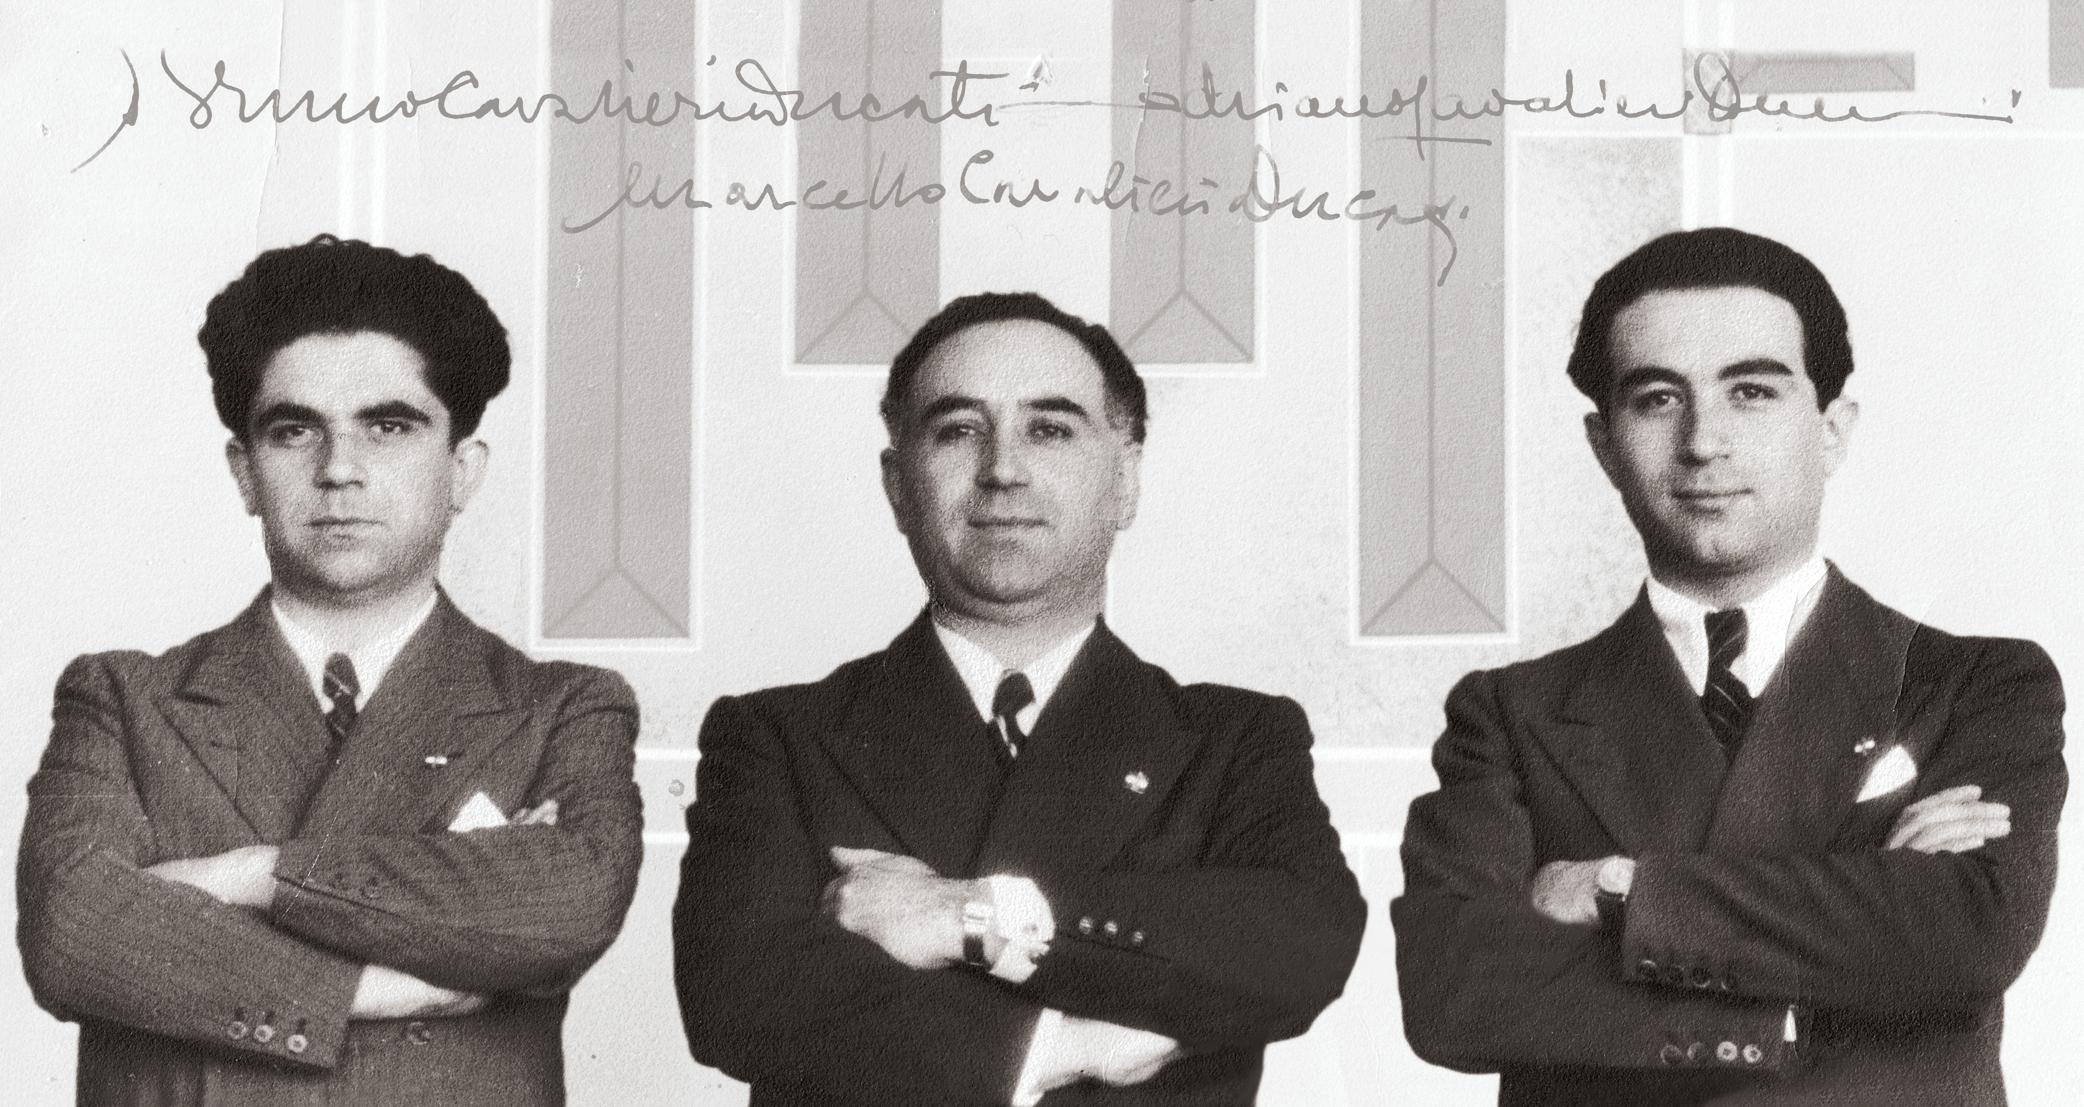 Adriano, Bruno and Marcello: the dream of the Ducati brothers